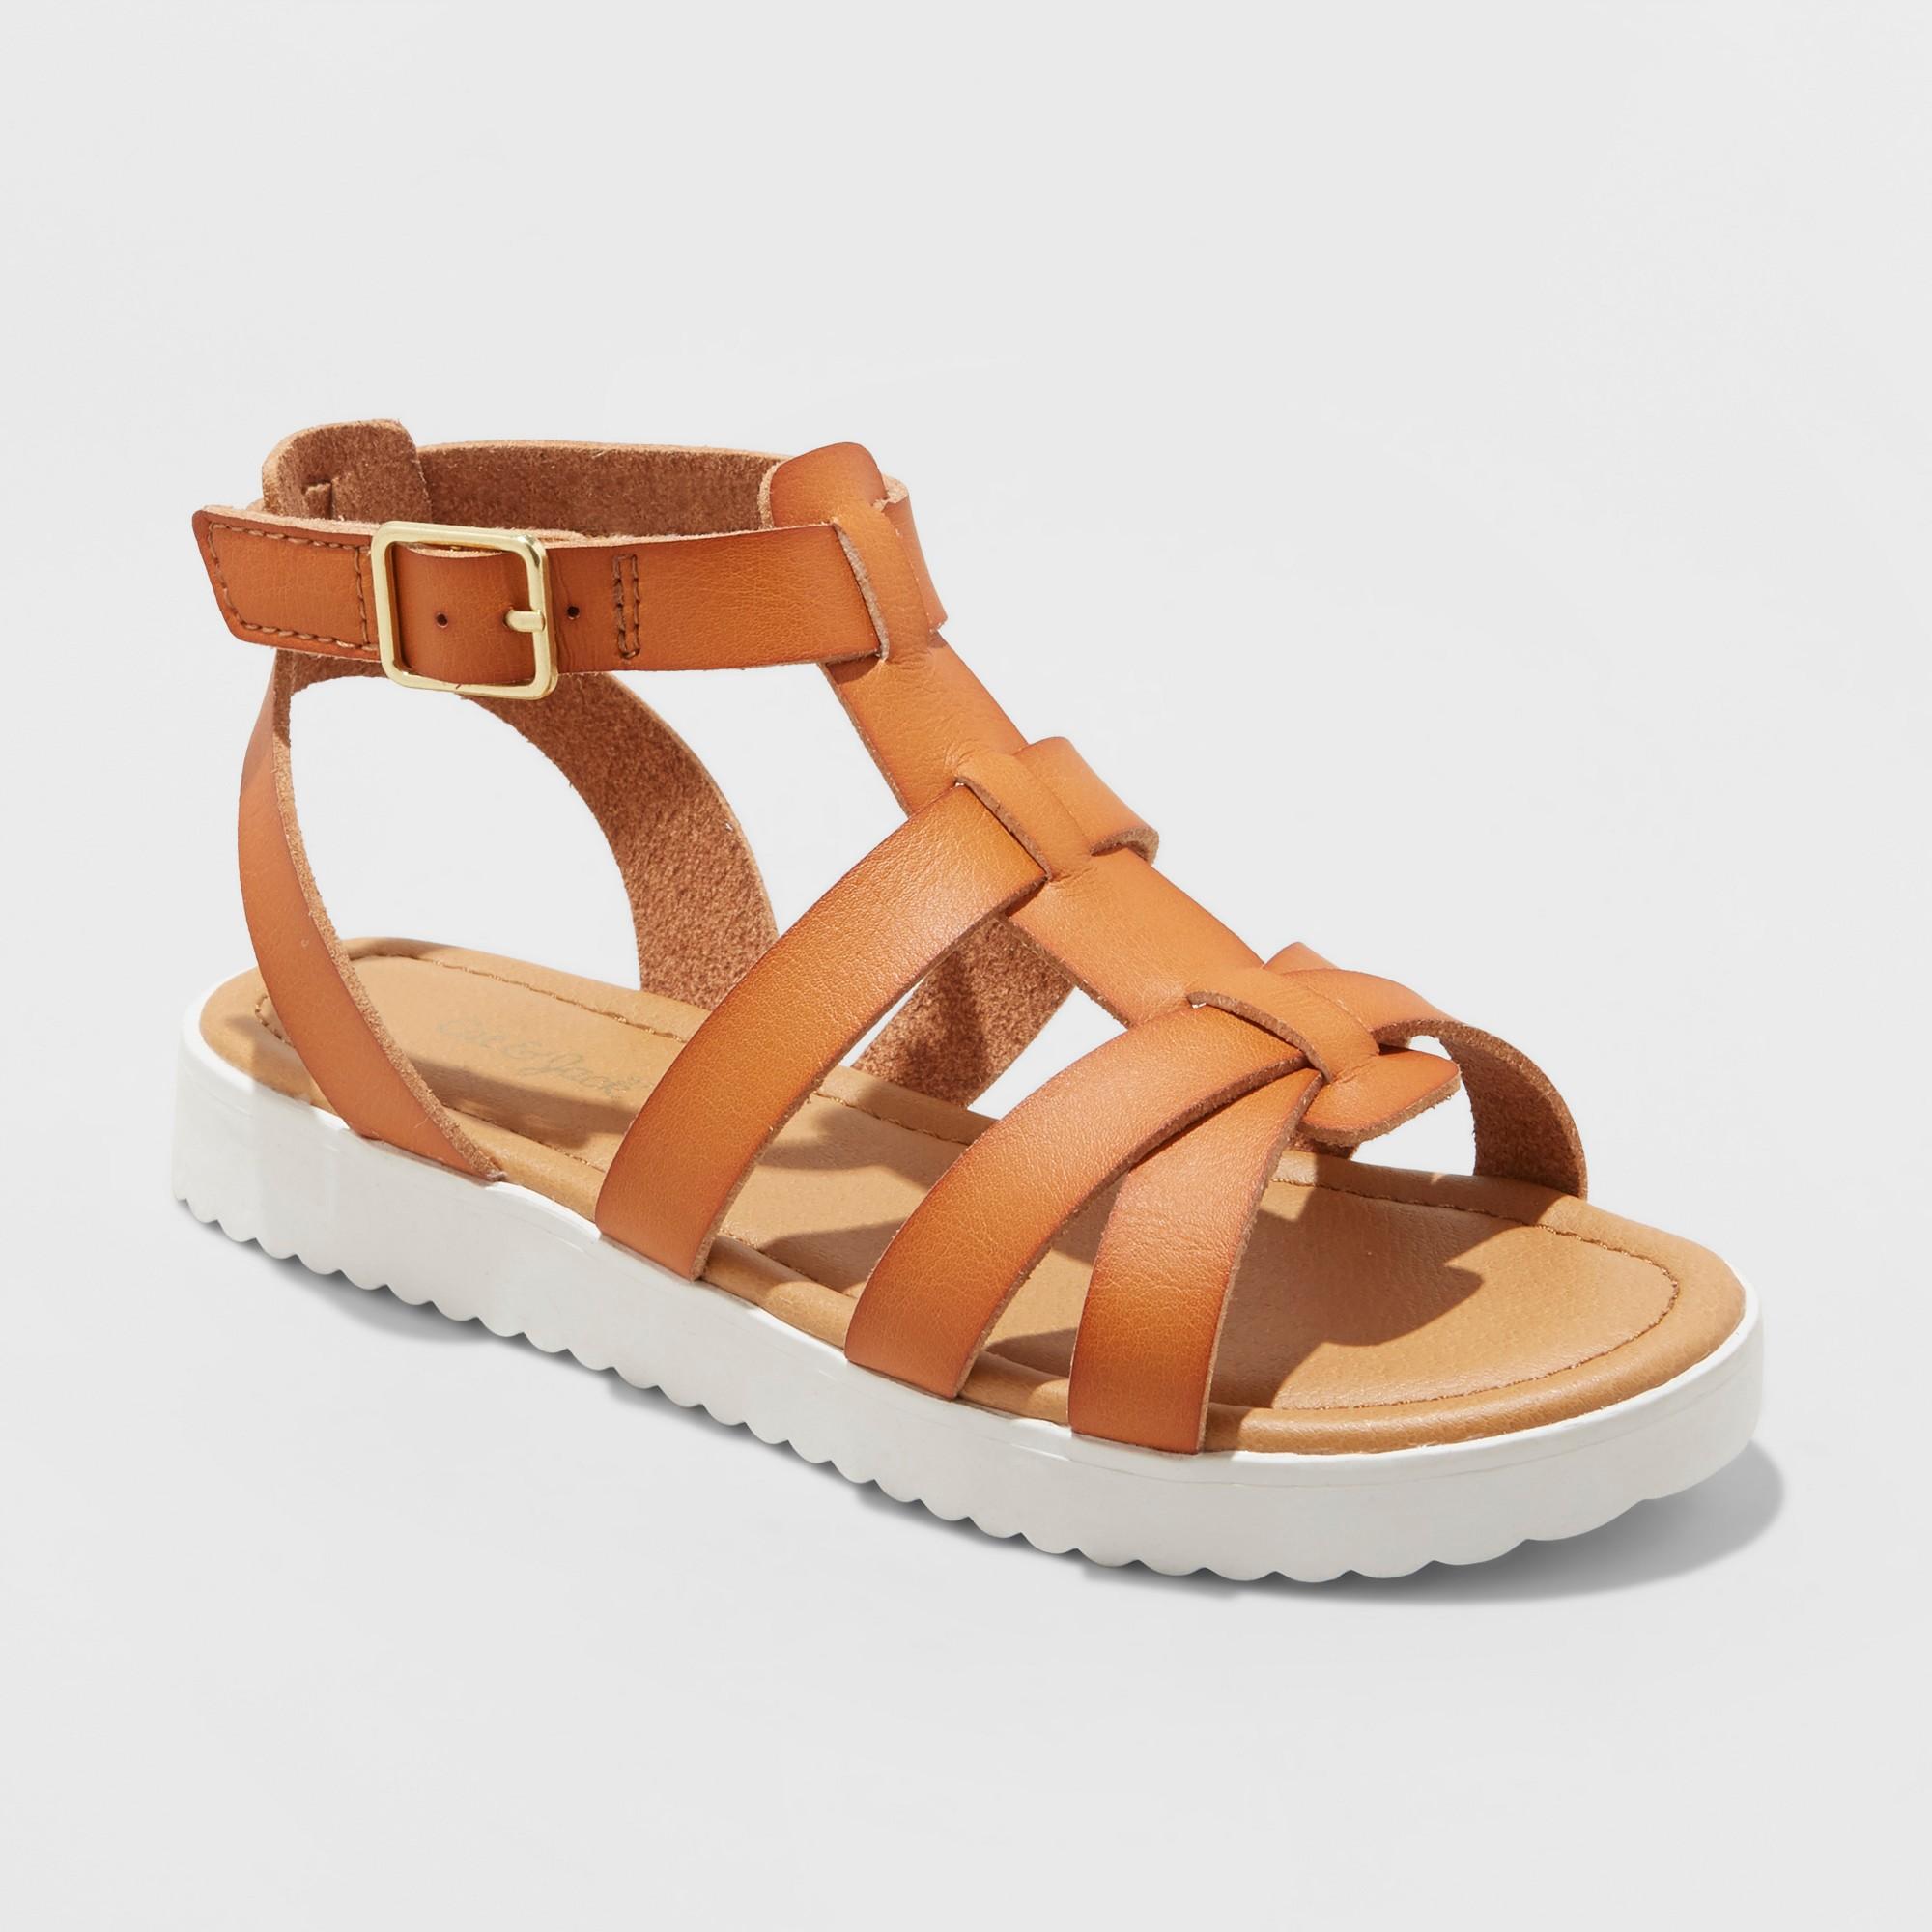 496ebe9d637c Girls  Antoinette Gladiator Sandals - Cat   Jack Cognac 13